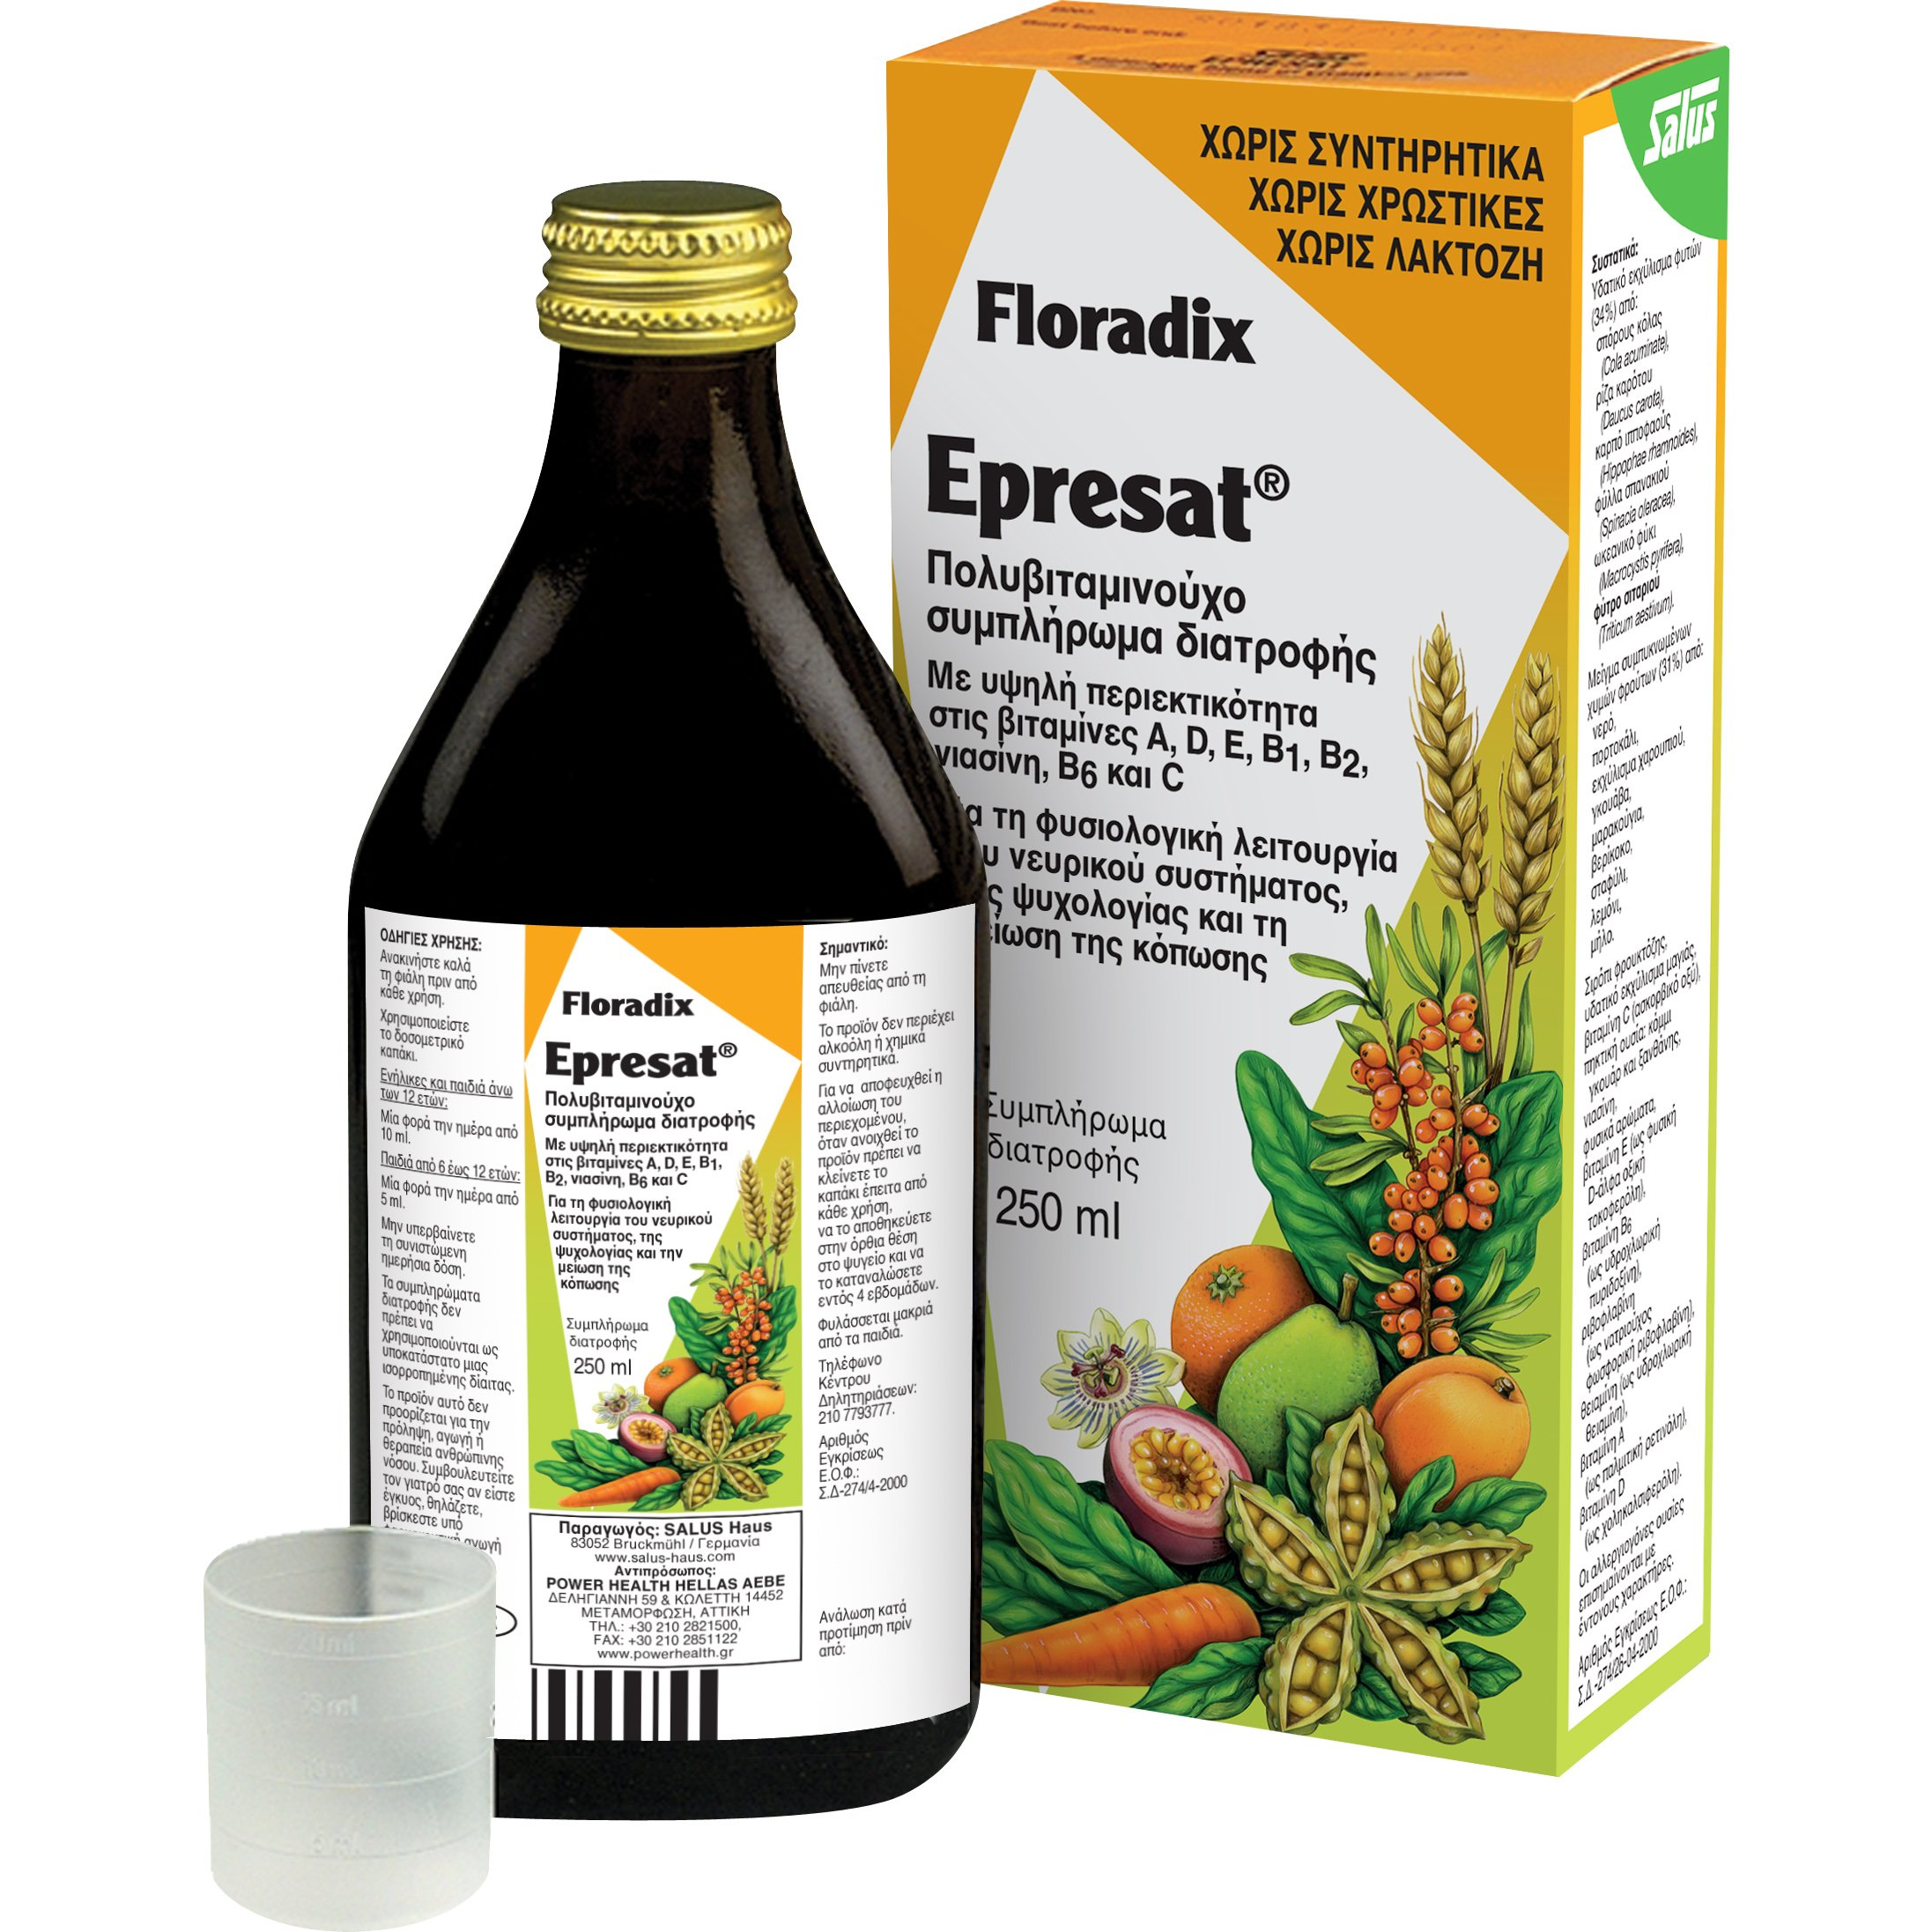 Power Health Epresat Πολυβιταμινούχο Συμπλήρωμα Διατροφής που Ενισχύει την Μνήμη & την Αυτοσυγκέντρωση 250ml